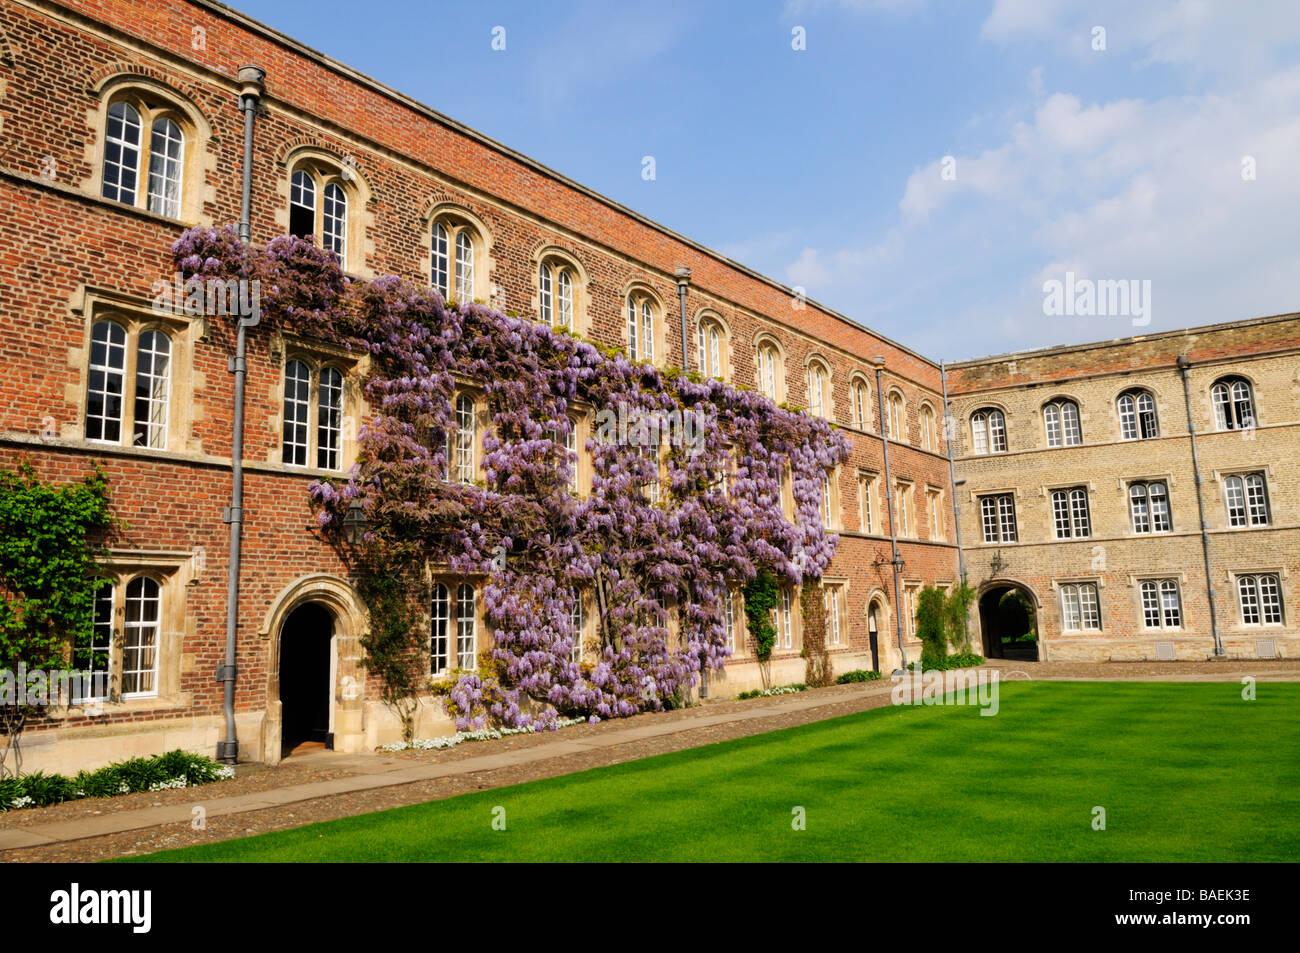 First Court at Jesus College,Cambridge, England, uk - Stock Image